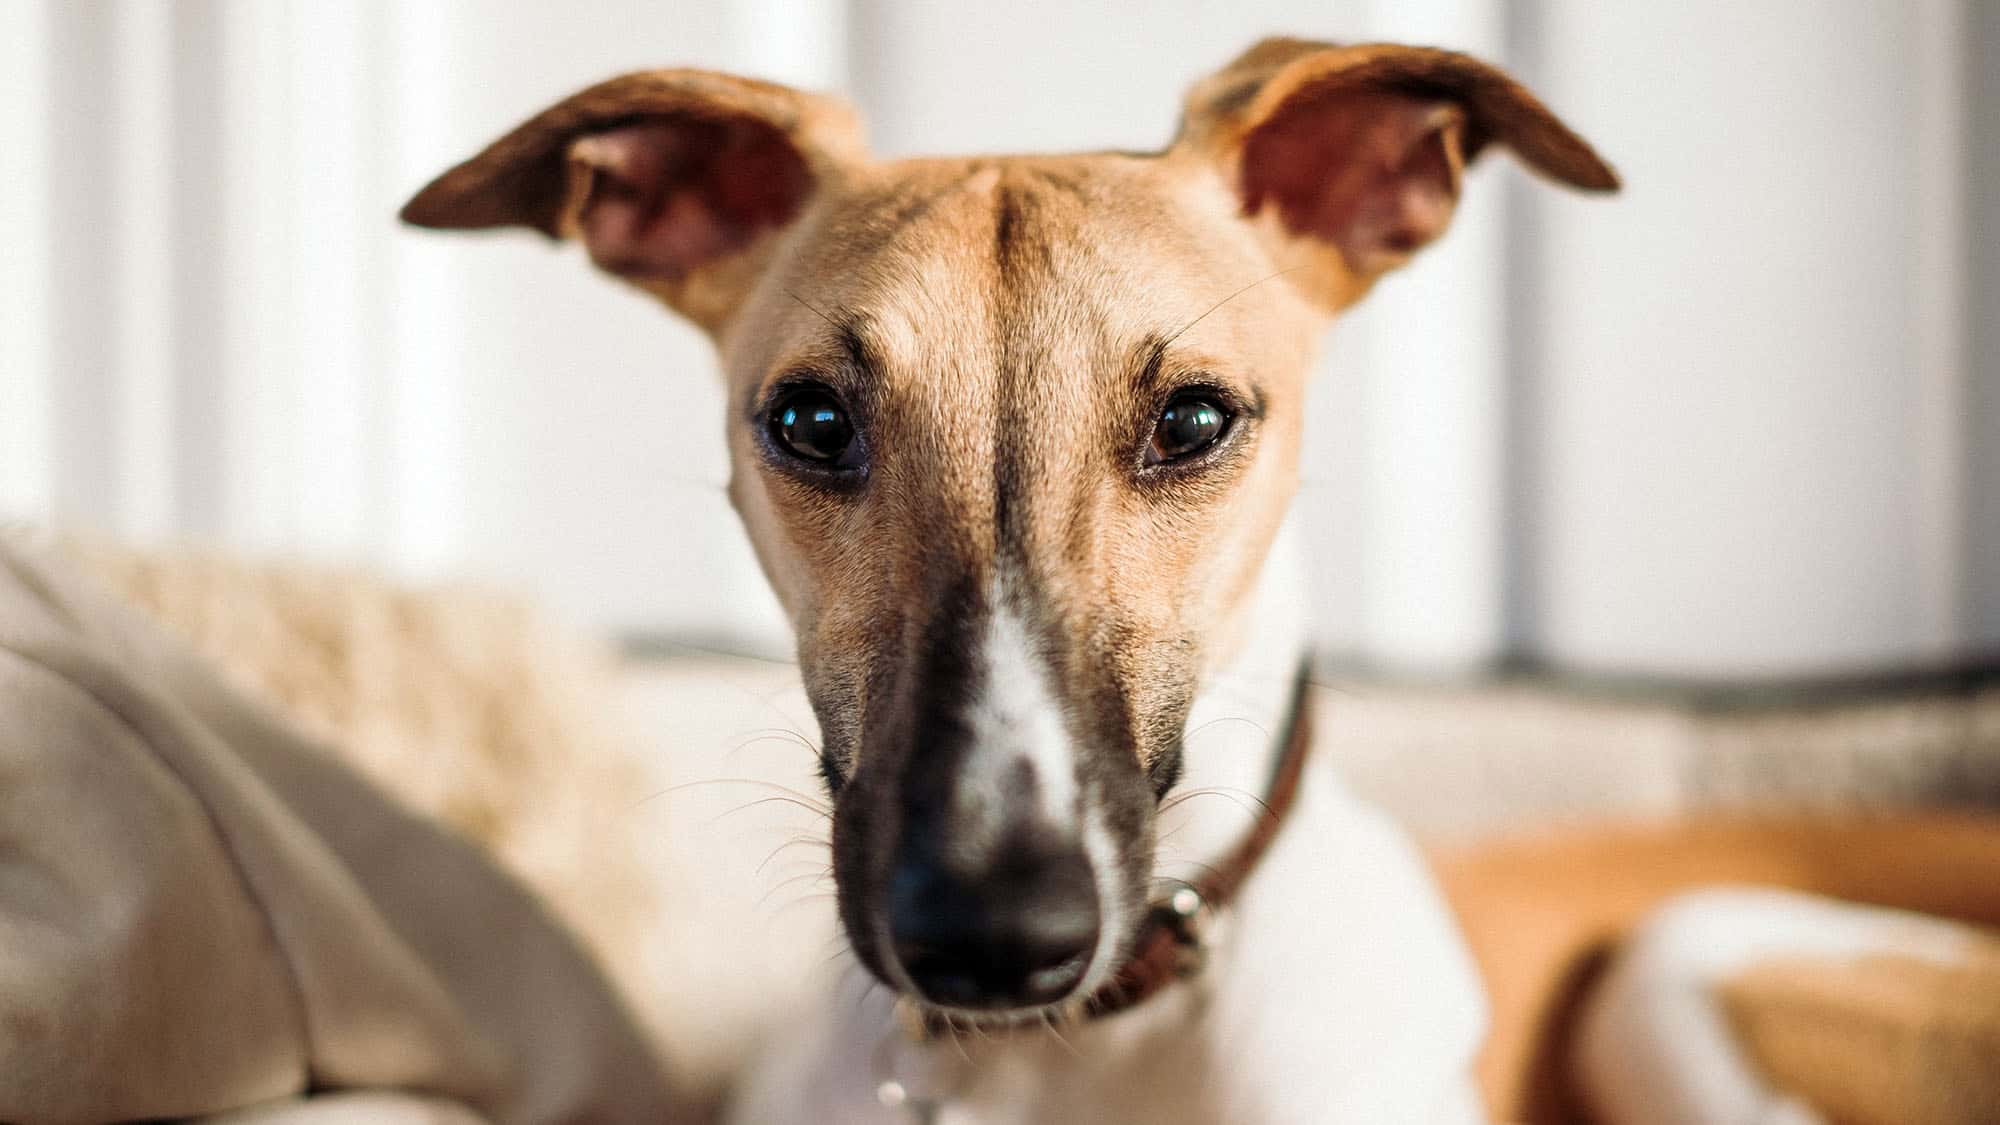 CyberPet - Italian Greyhound